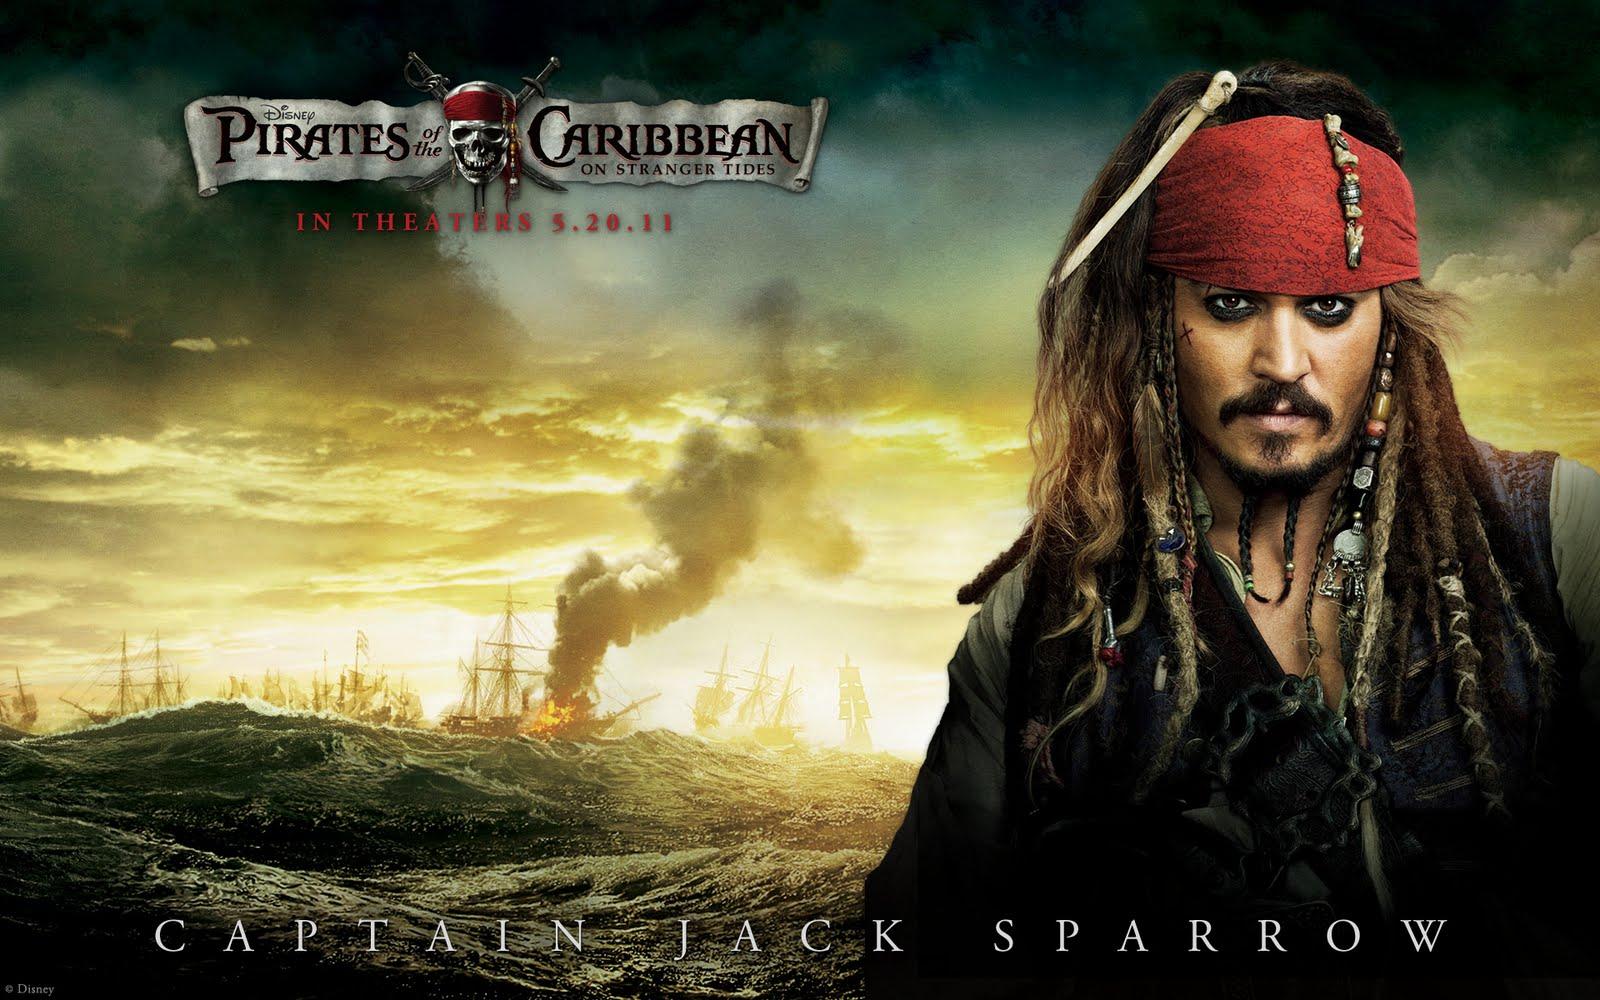 http://2.bp.blogspot.com/-EszM55RW7lw/Ta3-Px_TGAI/AAAAAAAABWg/DmEQcfYsSqk/s1600/Pirates+of+the+Caribbean_On+Stranger+Tides_Jack+Sparrow.jpg